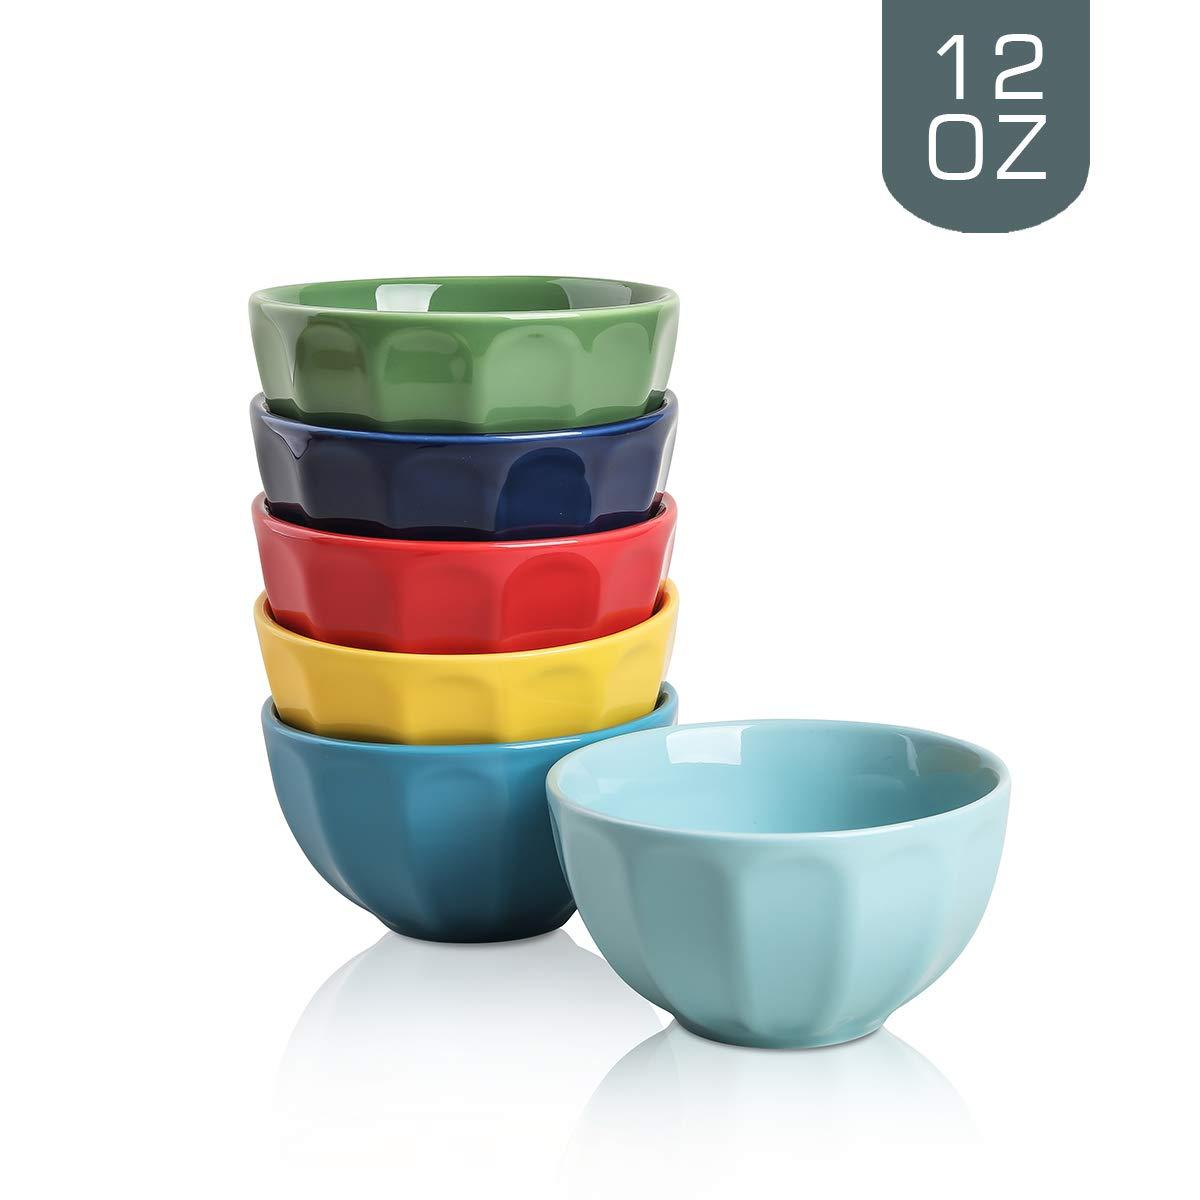 Selamica Porcelain Fluted Latte Bowl Set - 12 Ounce for Rice, Soup, Snacks - Set of 6, Assorted colors